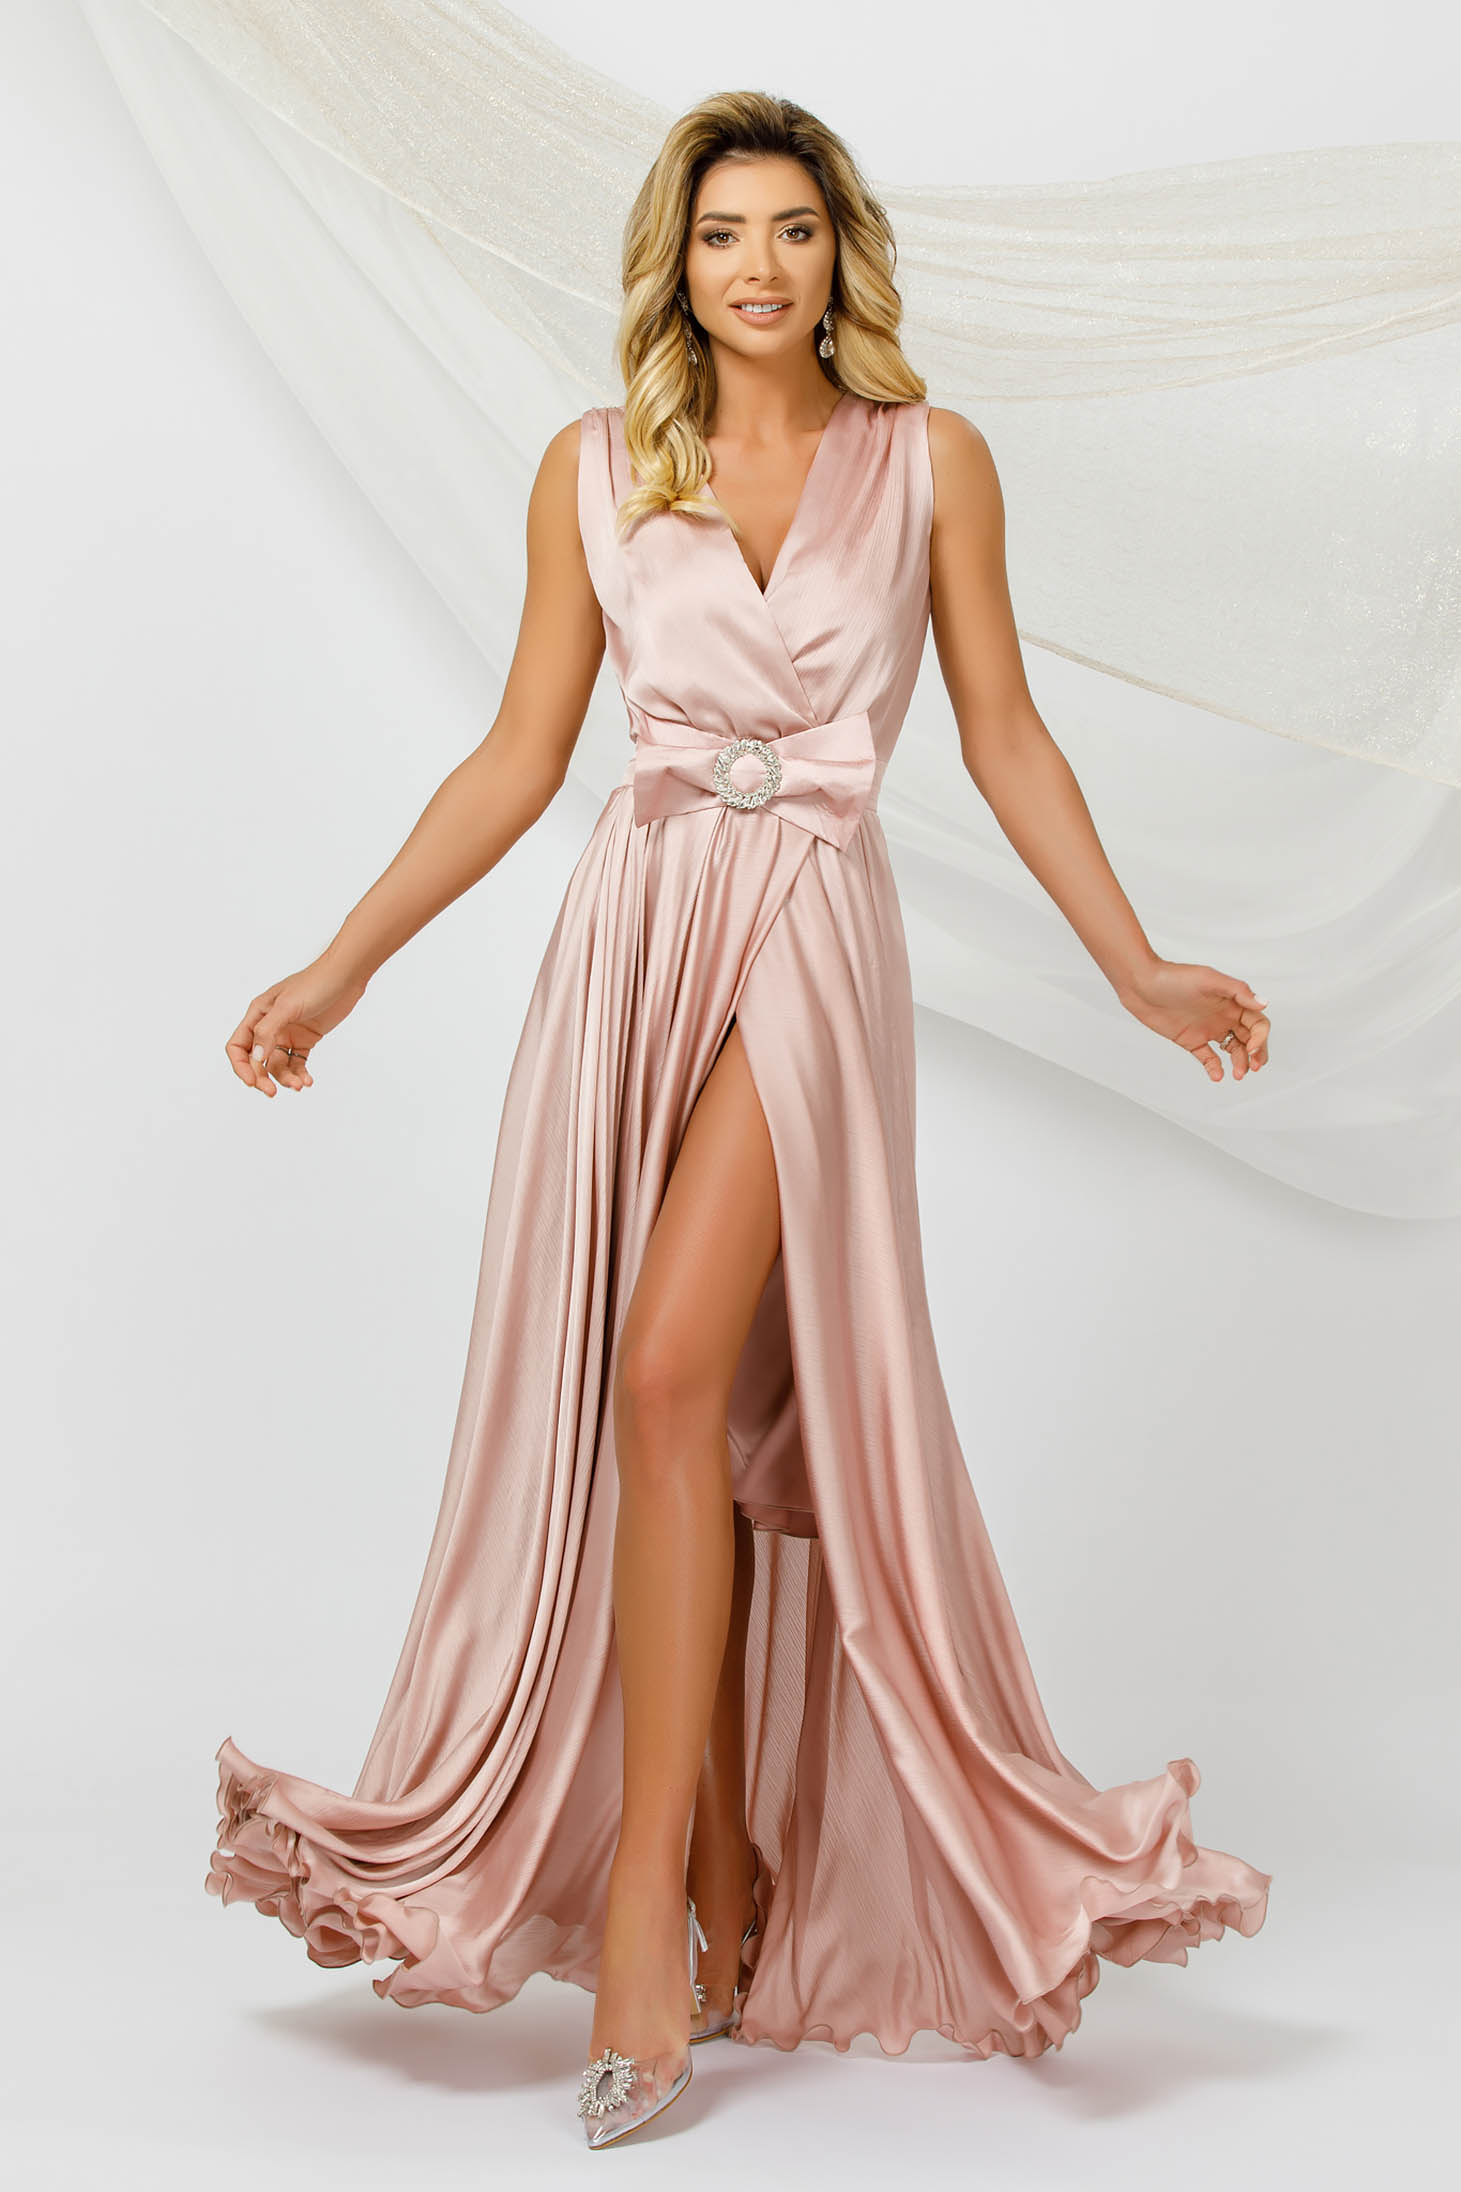 Lightpink dress long cloche from veil fabric from satin fabric texture sleeveless occasional